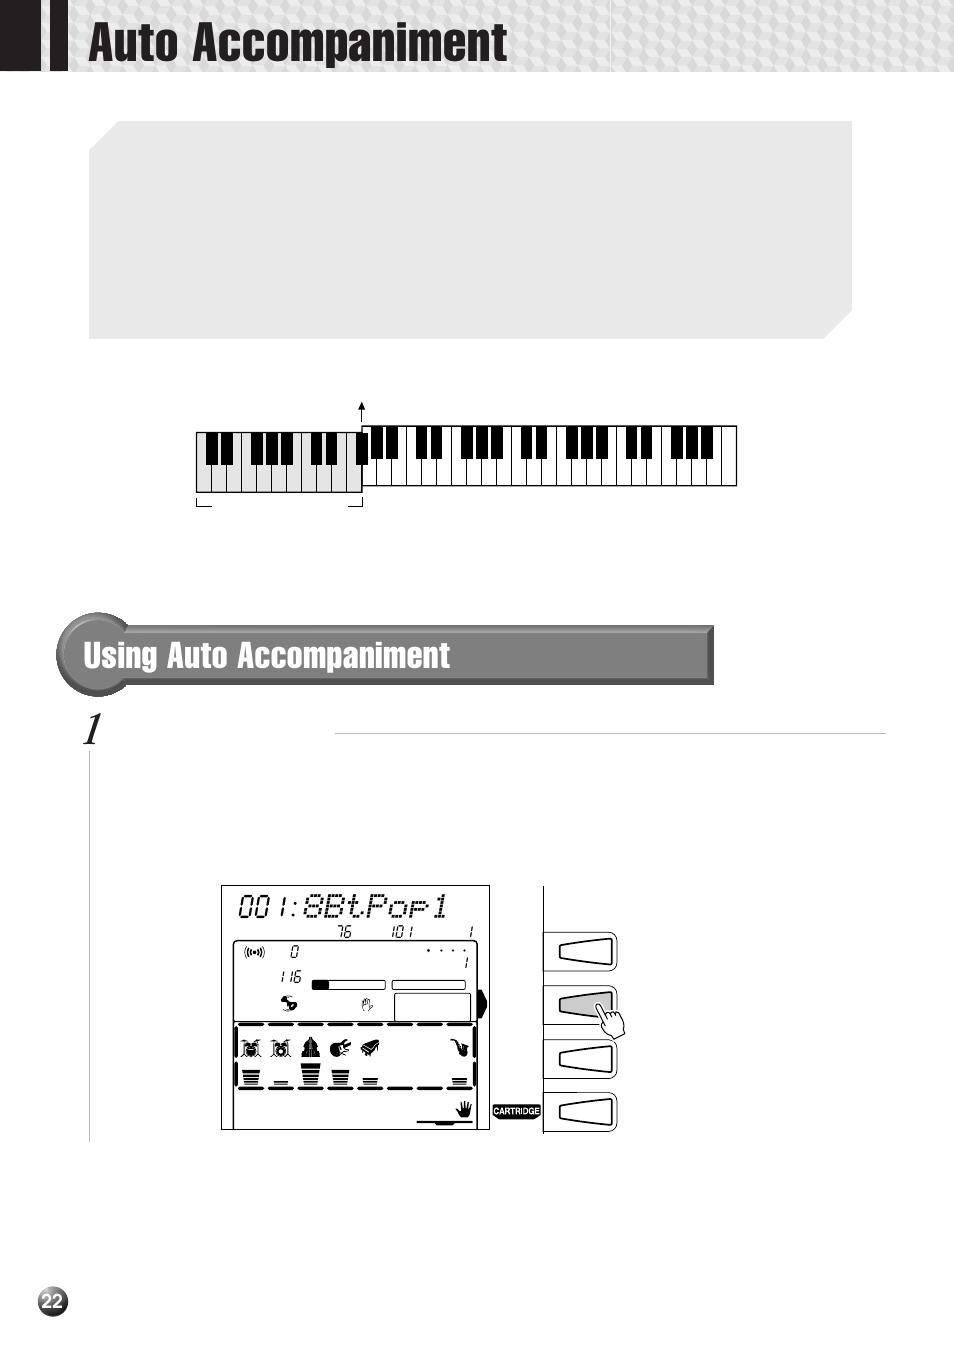 auto accompaniment using auto accompaniment 8btpop1 yamaha psr rh manualsdir com yamaha psr 530 manual pdf yamaha psr 540 manual pdf download